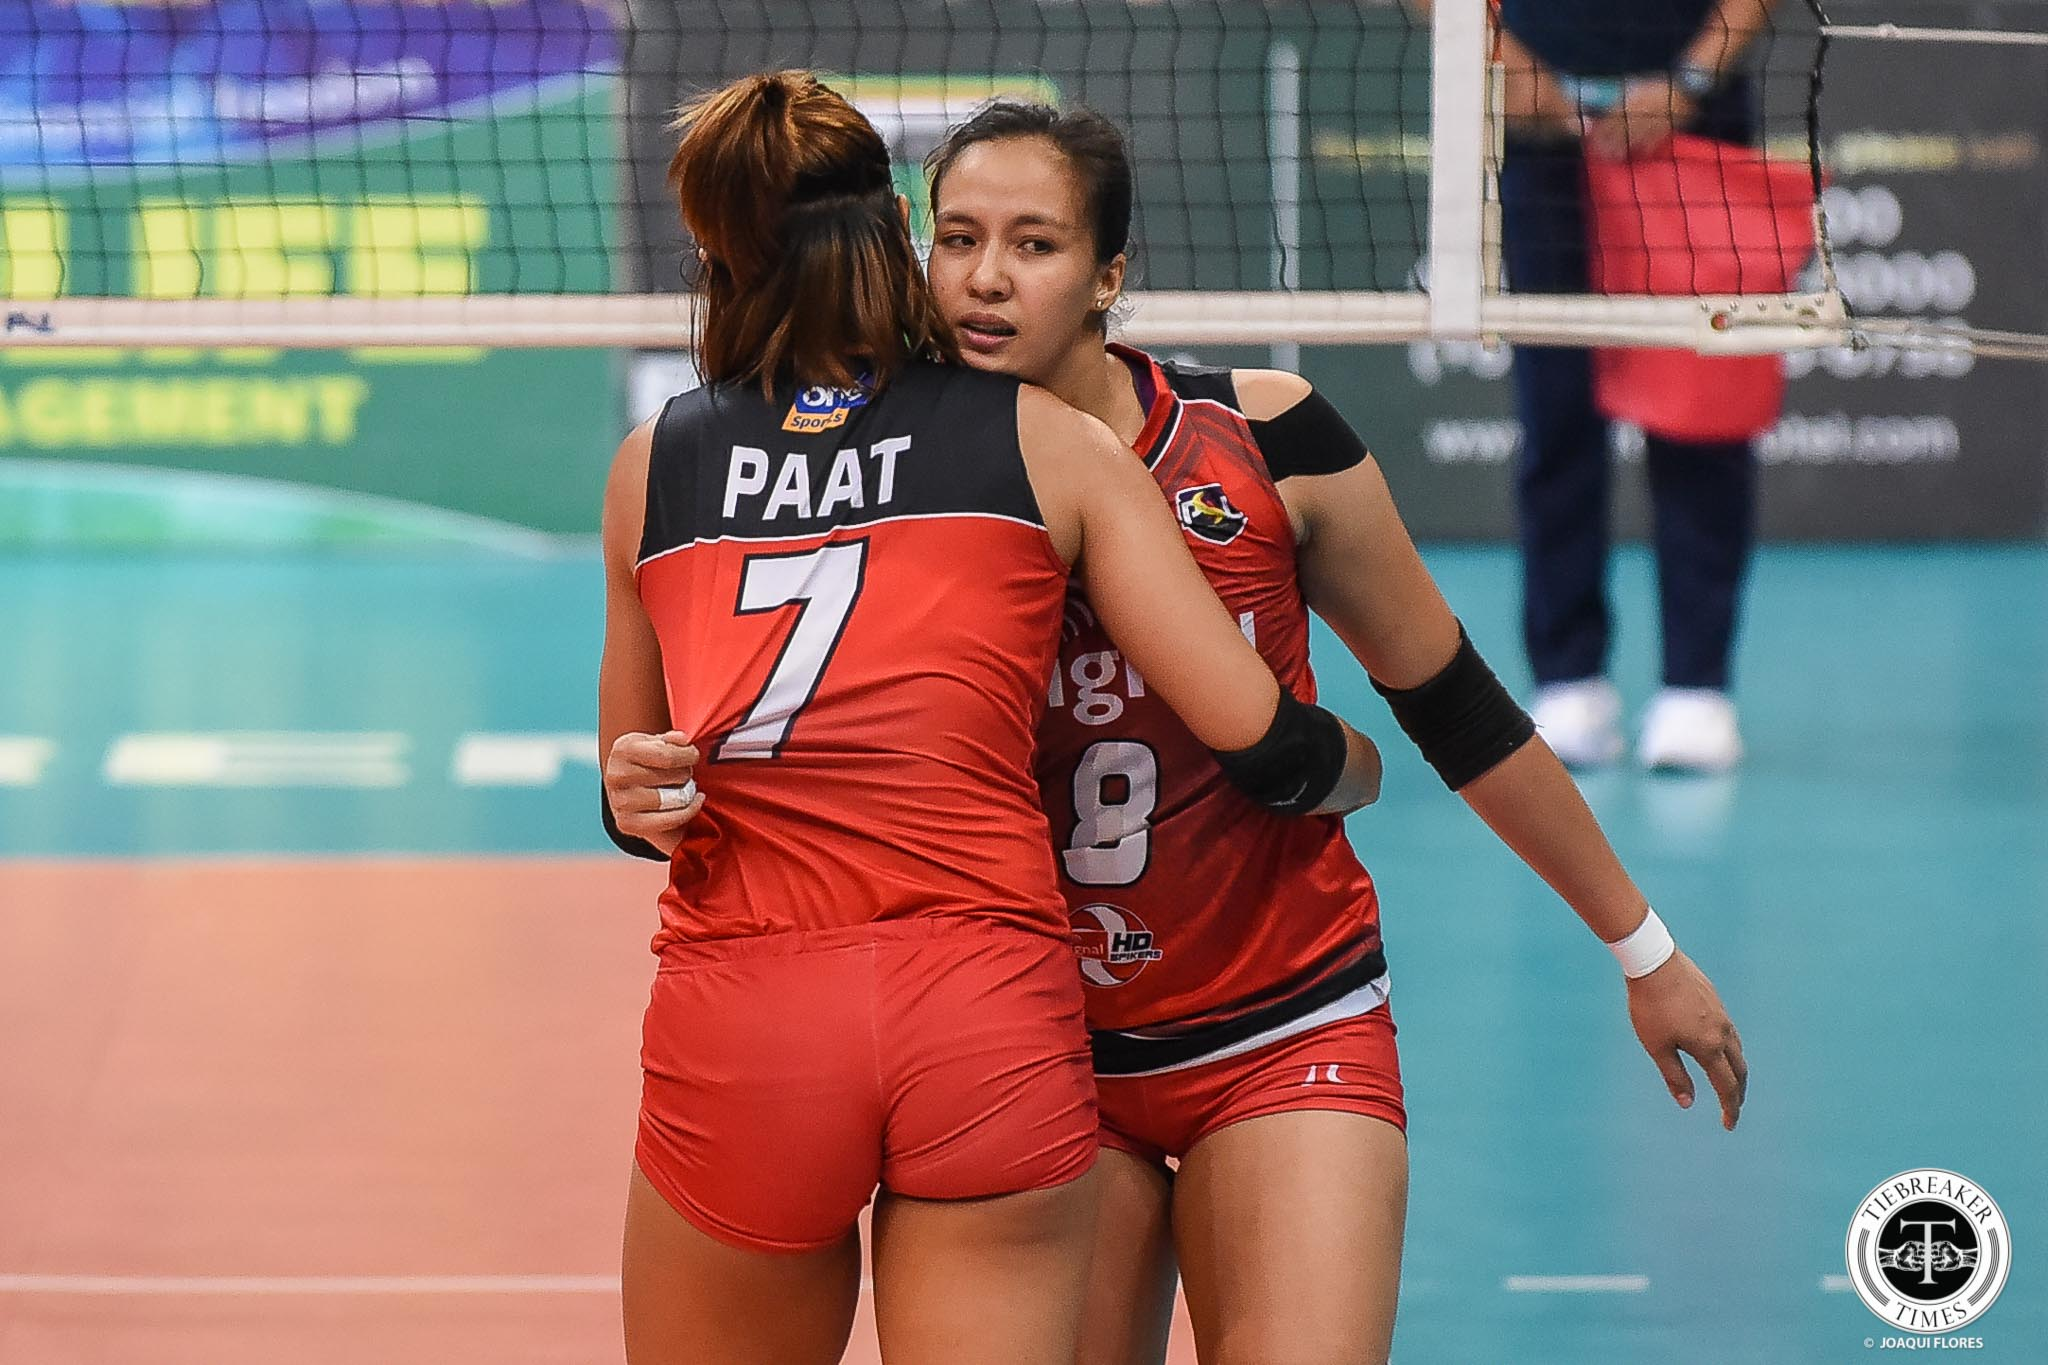 PSL-AFC-Finals-G2-F2-Logistics-vs.-Cignal-Gonzaga-4742 Shaq delos Santos bares long lay-off, short camp affected Cignal's play News PVL Volleyball  - philippine sports news